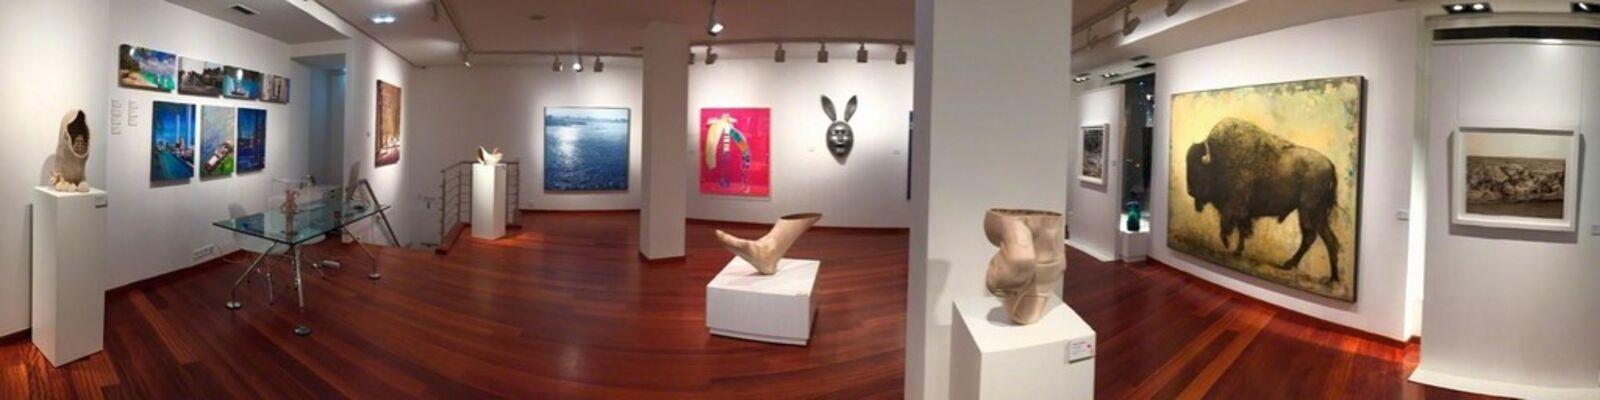 Contemporary Figuration, installation view